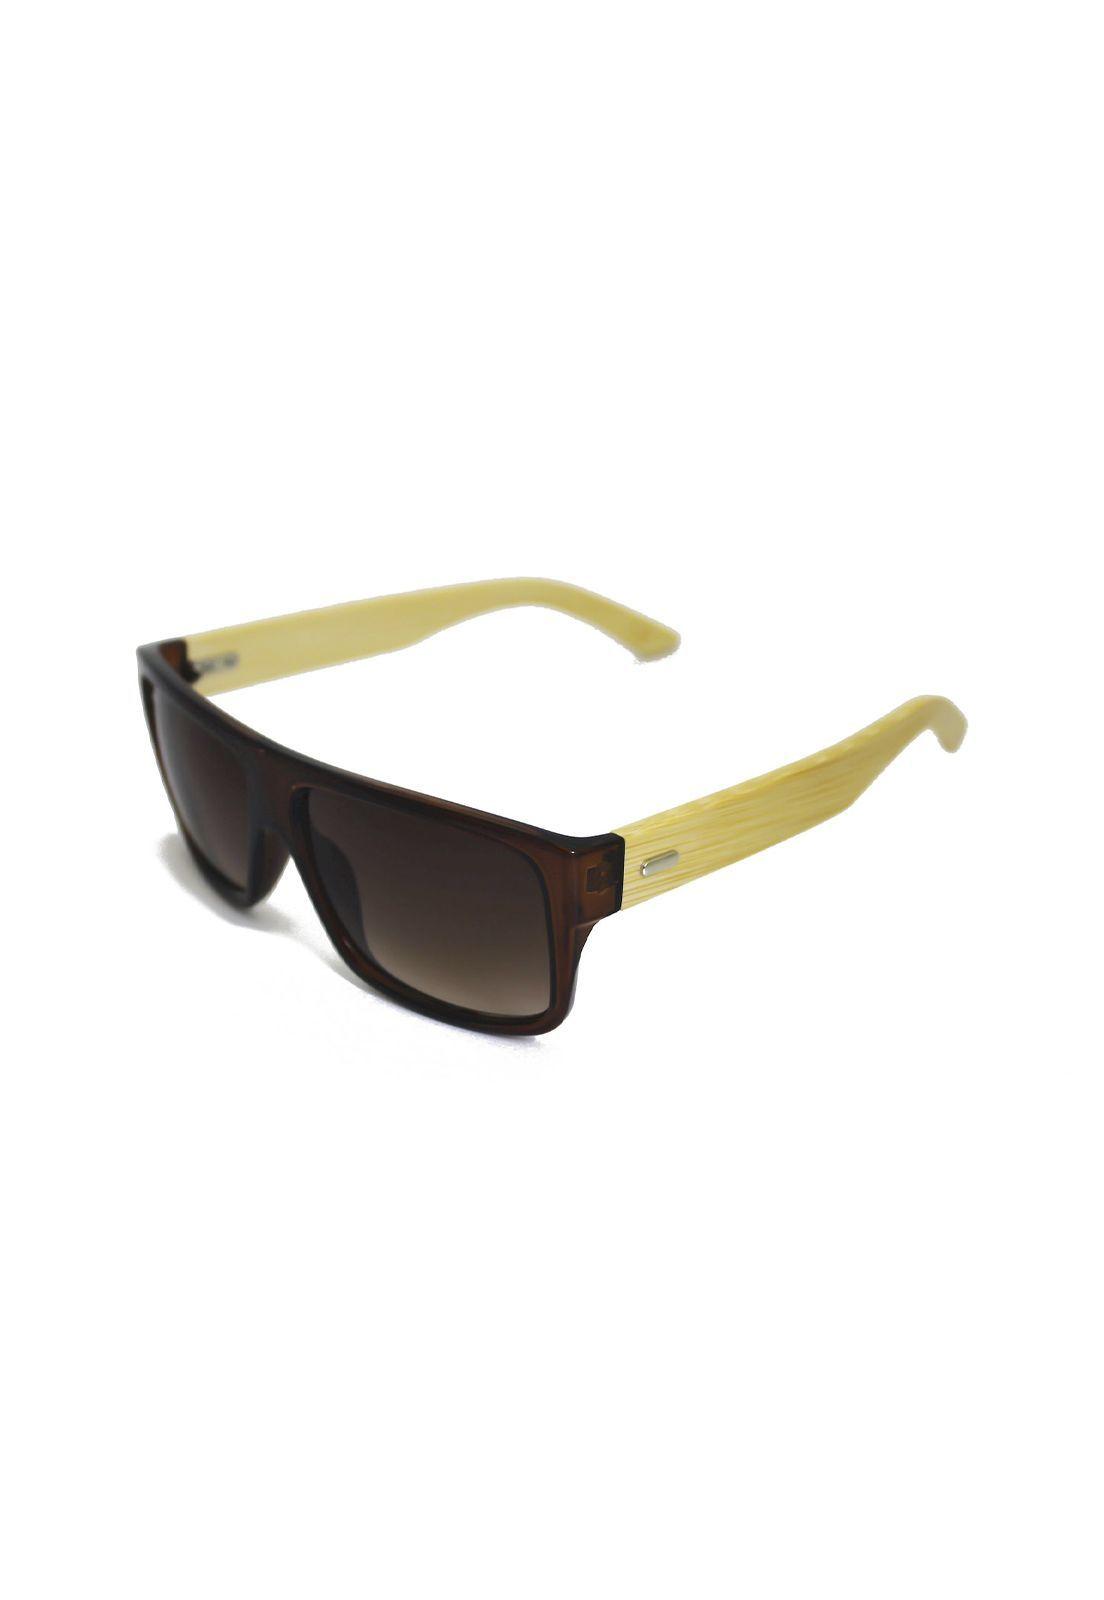 Óculos de Sol Grungetteria Bambooard Marrom